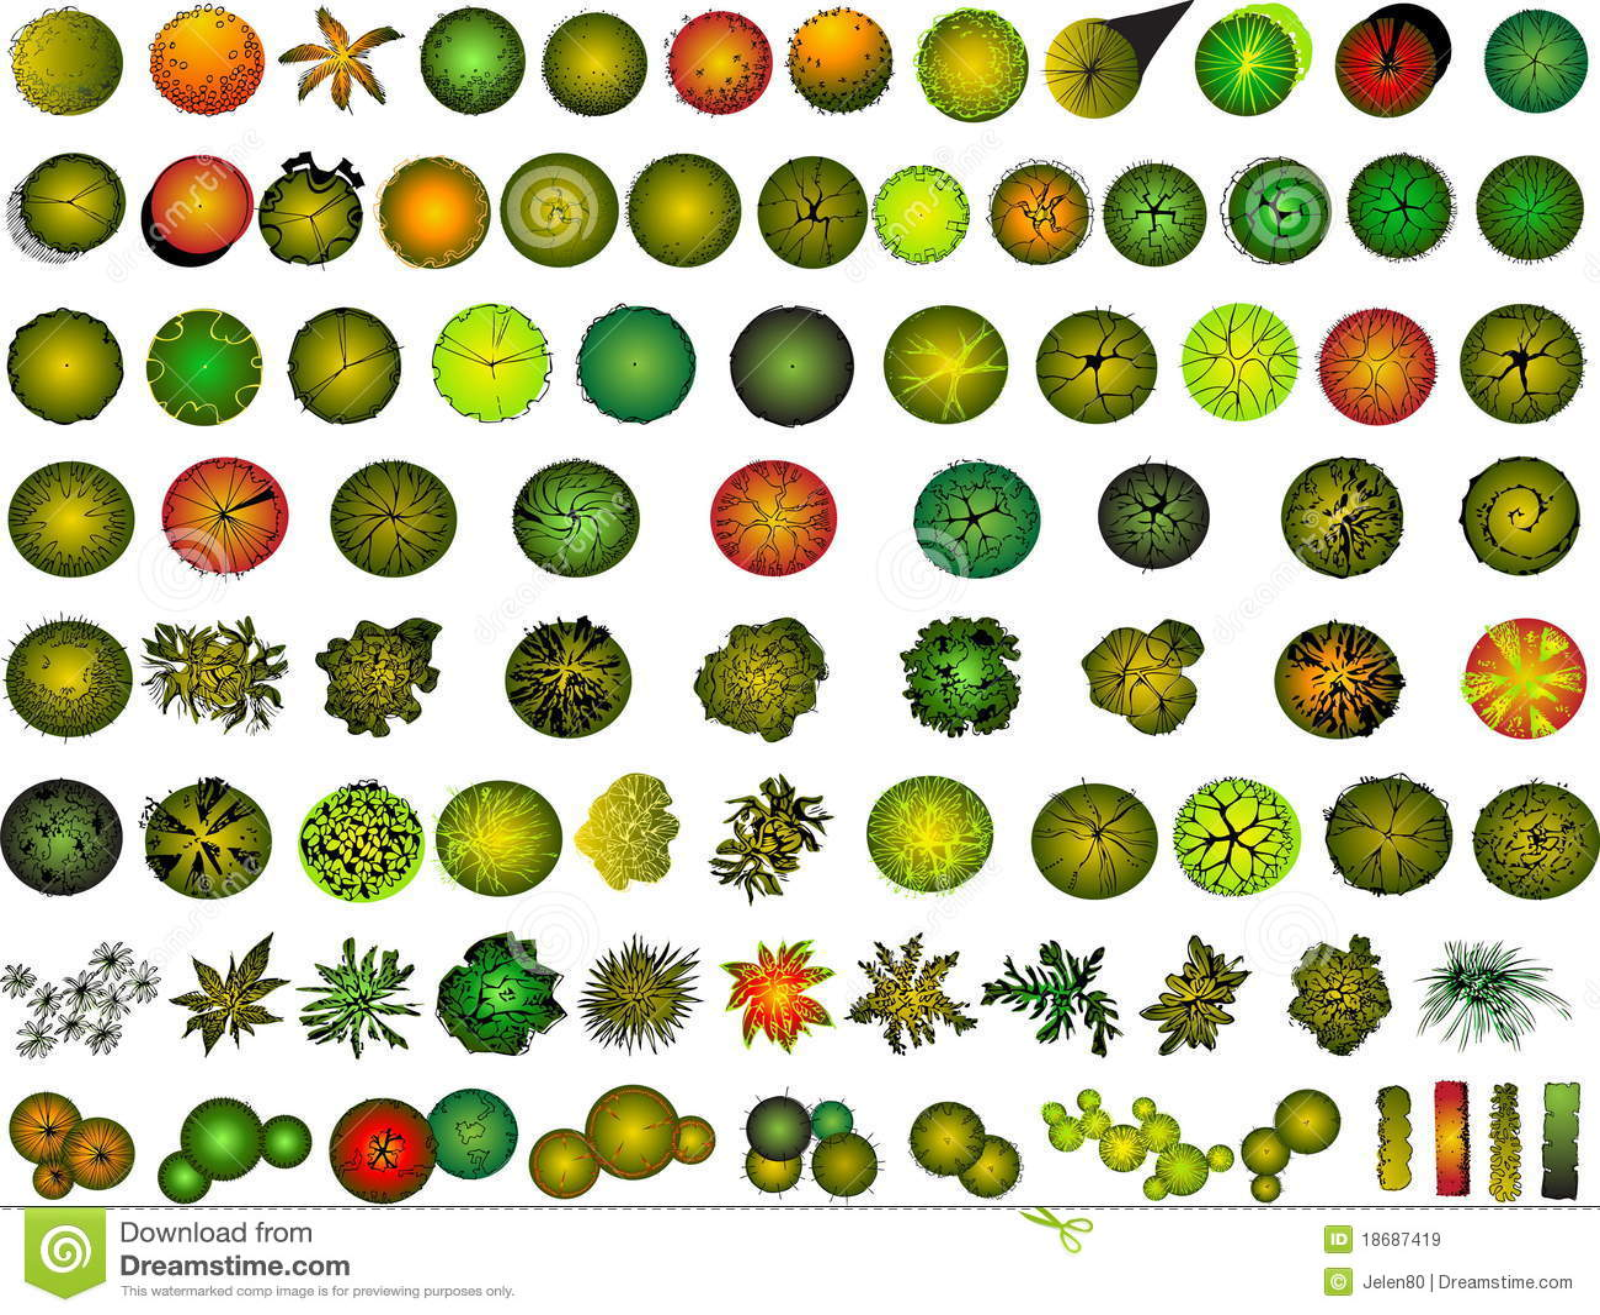 A Set Of Treetop Symbols Stock Image Illustration Of Garden 18687419